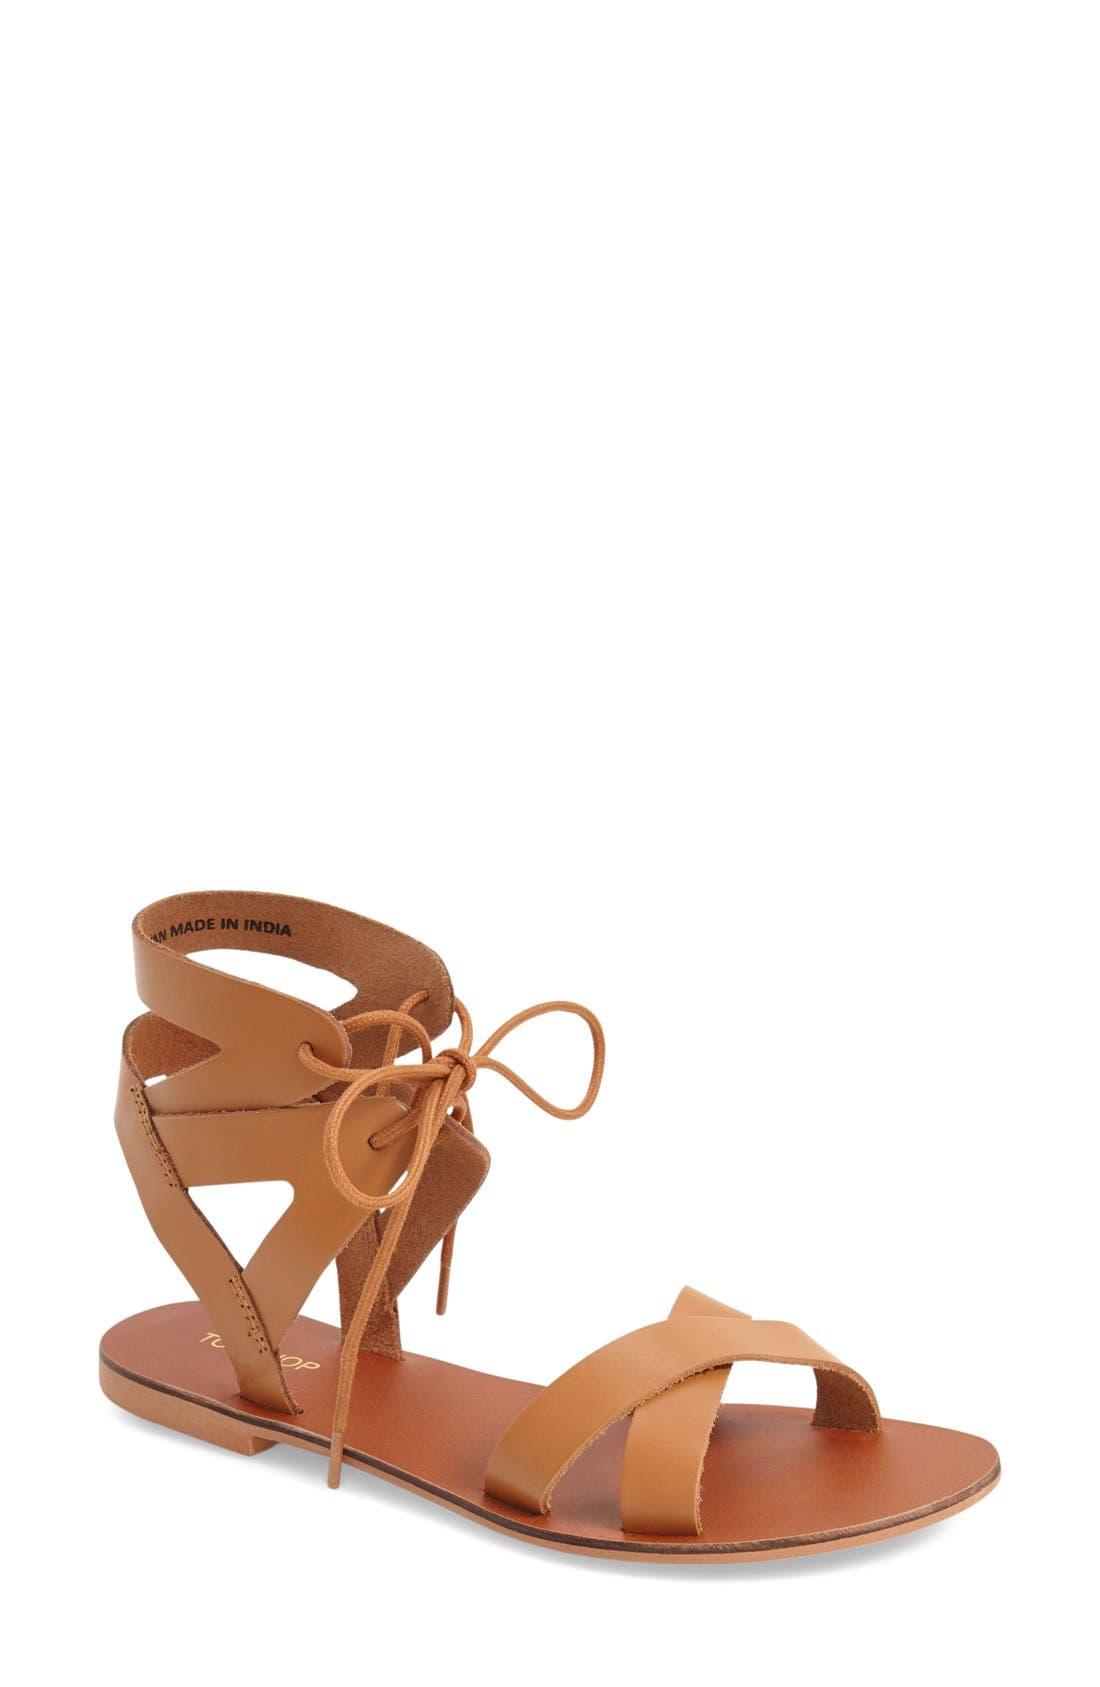 TOPSHOP 'Herb' Lace-Up Flat Sandal, Main, color, 210